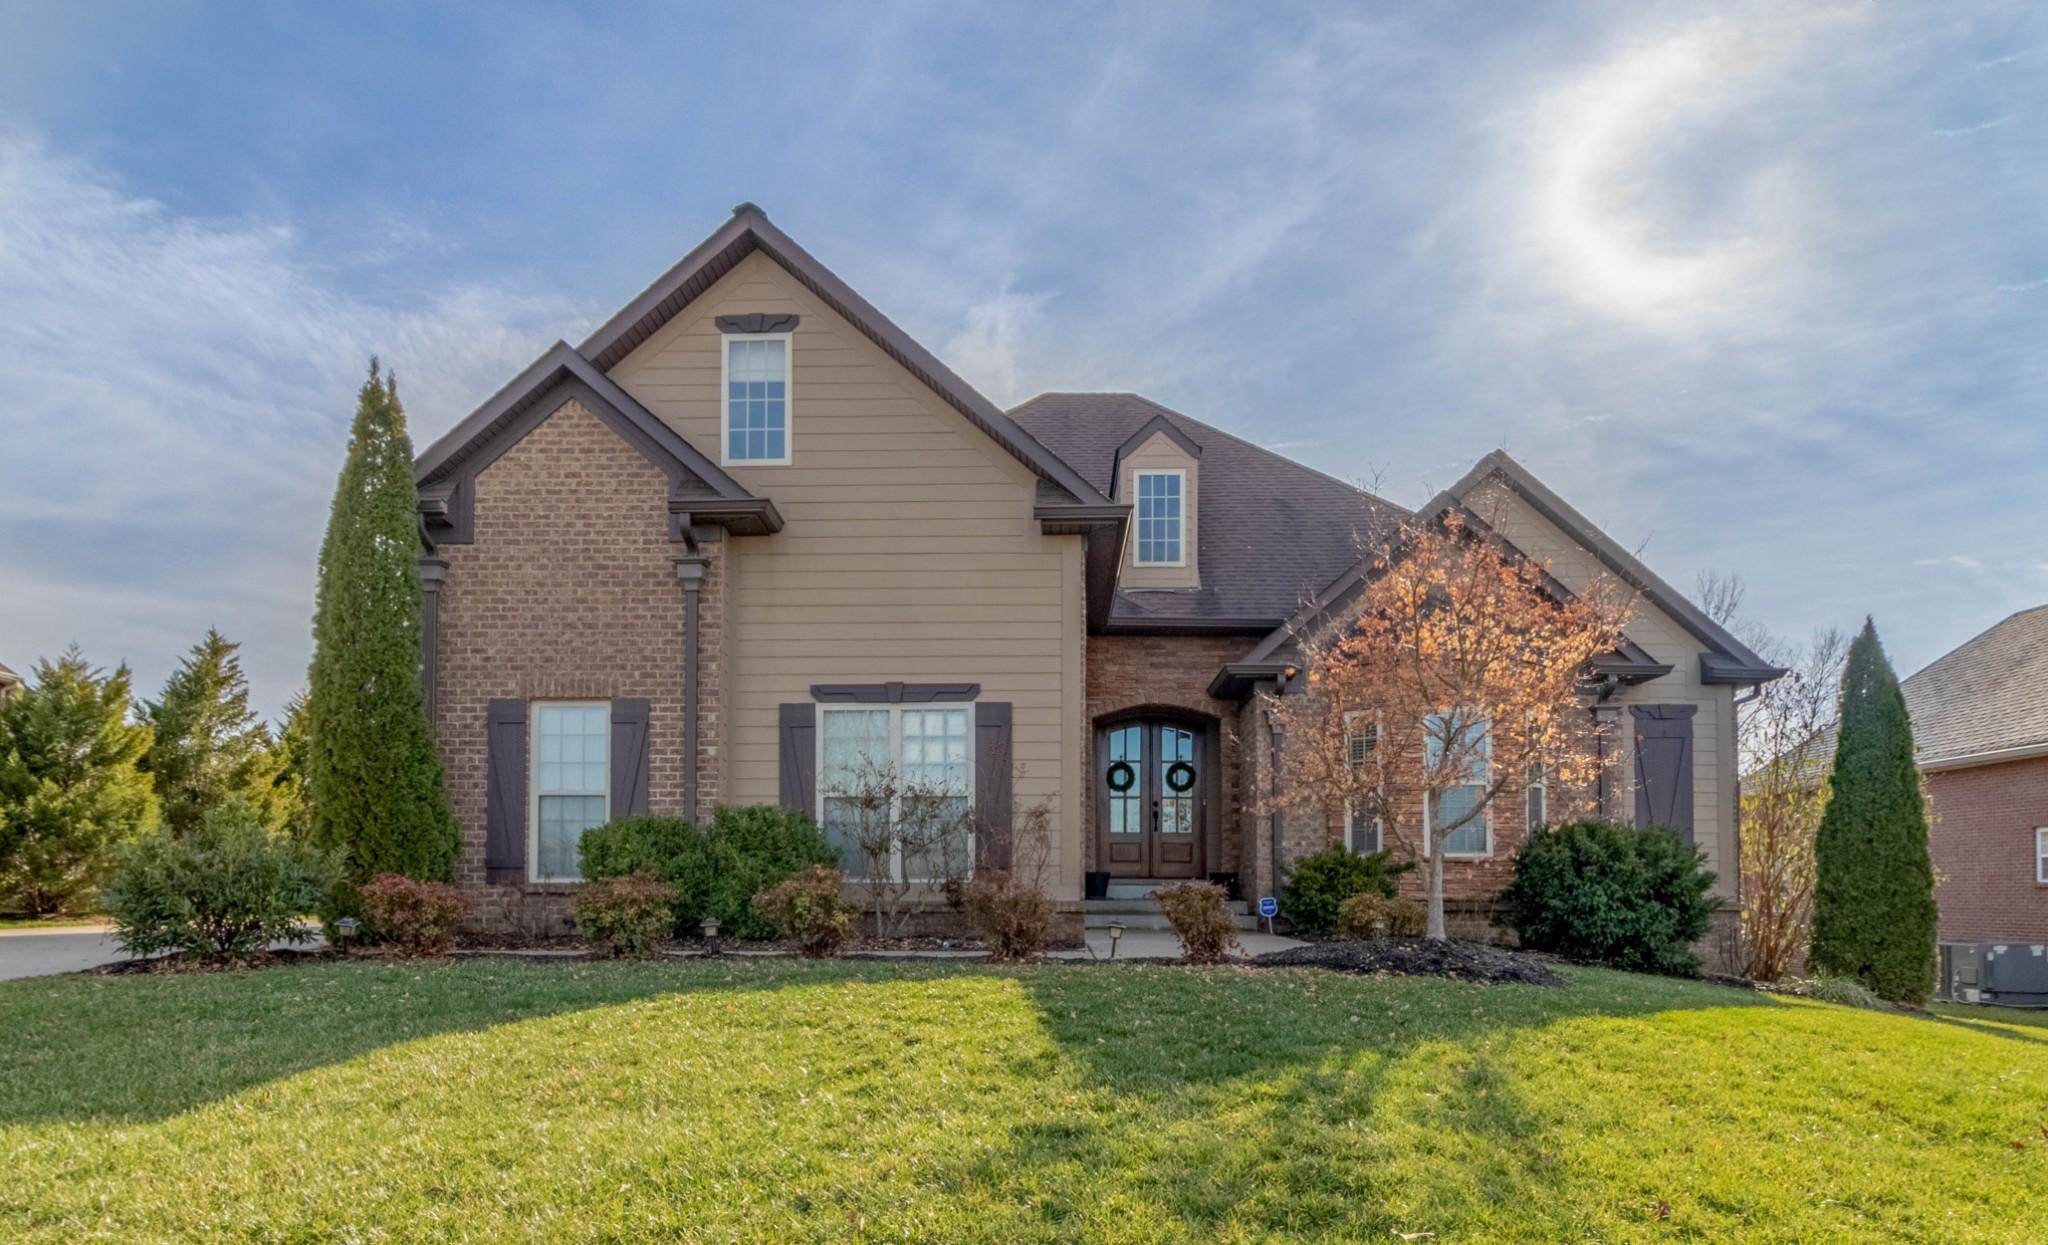 3592 Drake Rd, Adams, TN 37010 - Adams, TN real estate listing